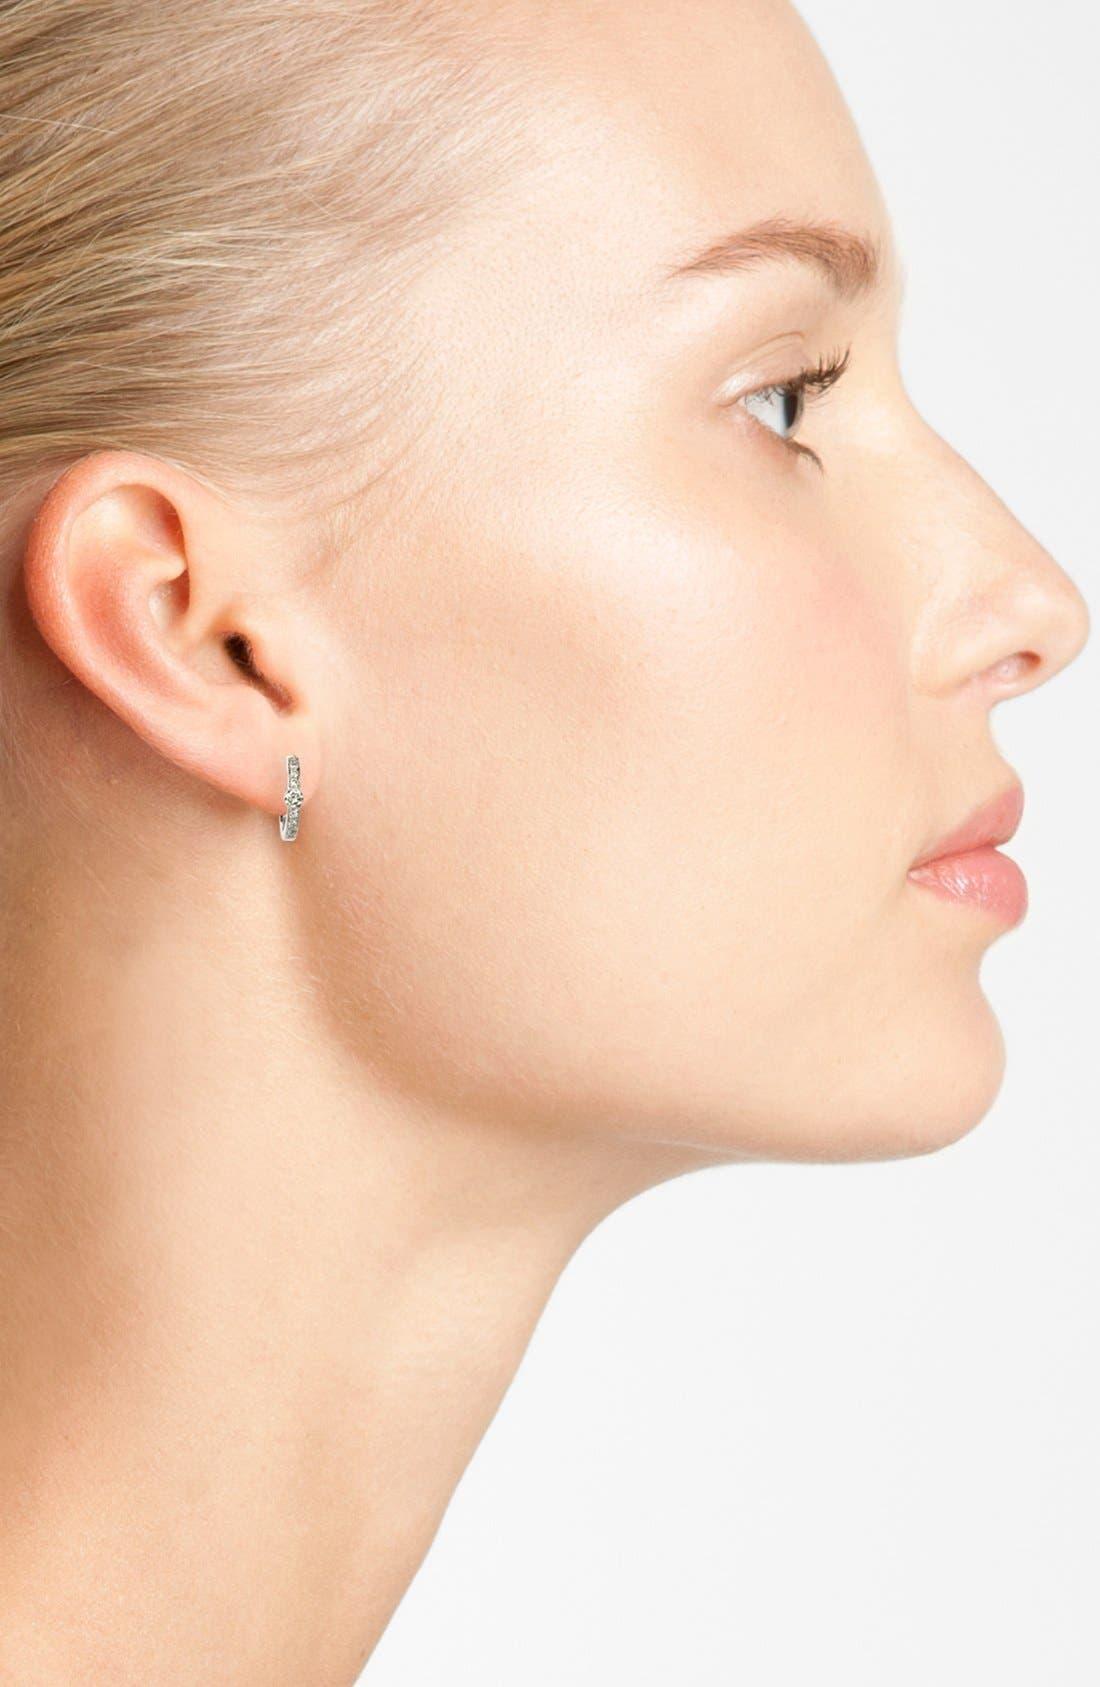 Alternate Image 2  - Bony Levy 'Linea' Small Diamond Hoop Earrings (Nordstrom Exclusive)